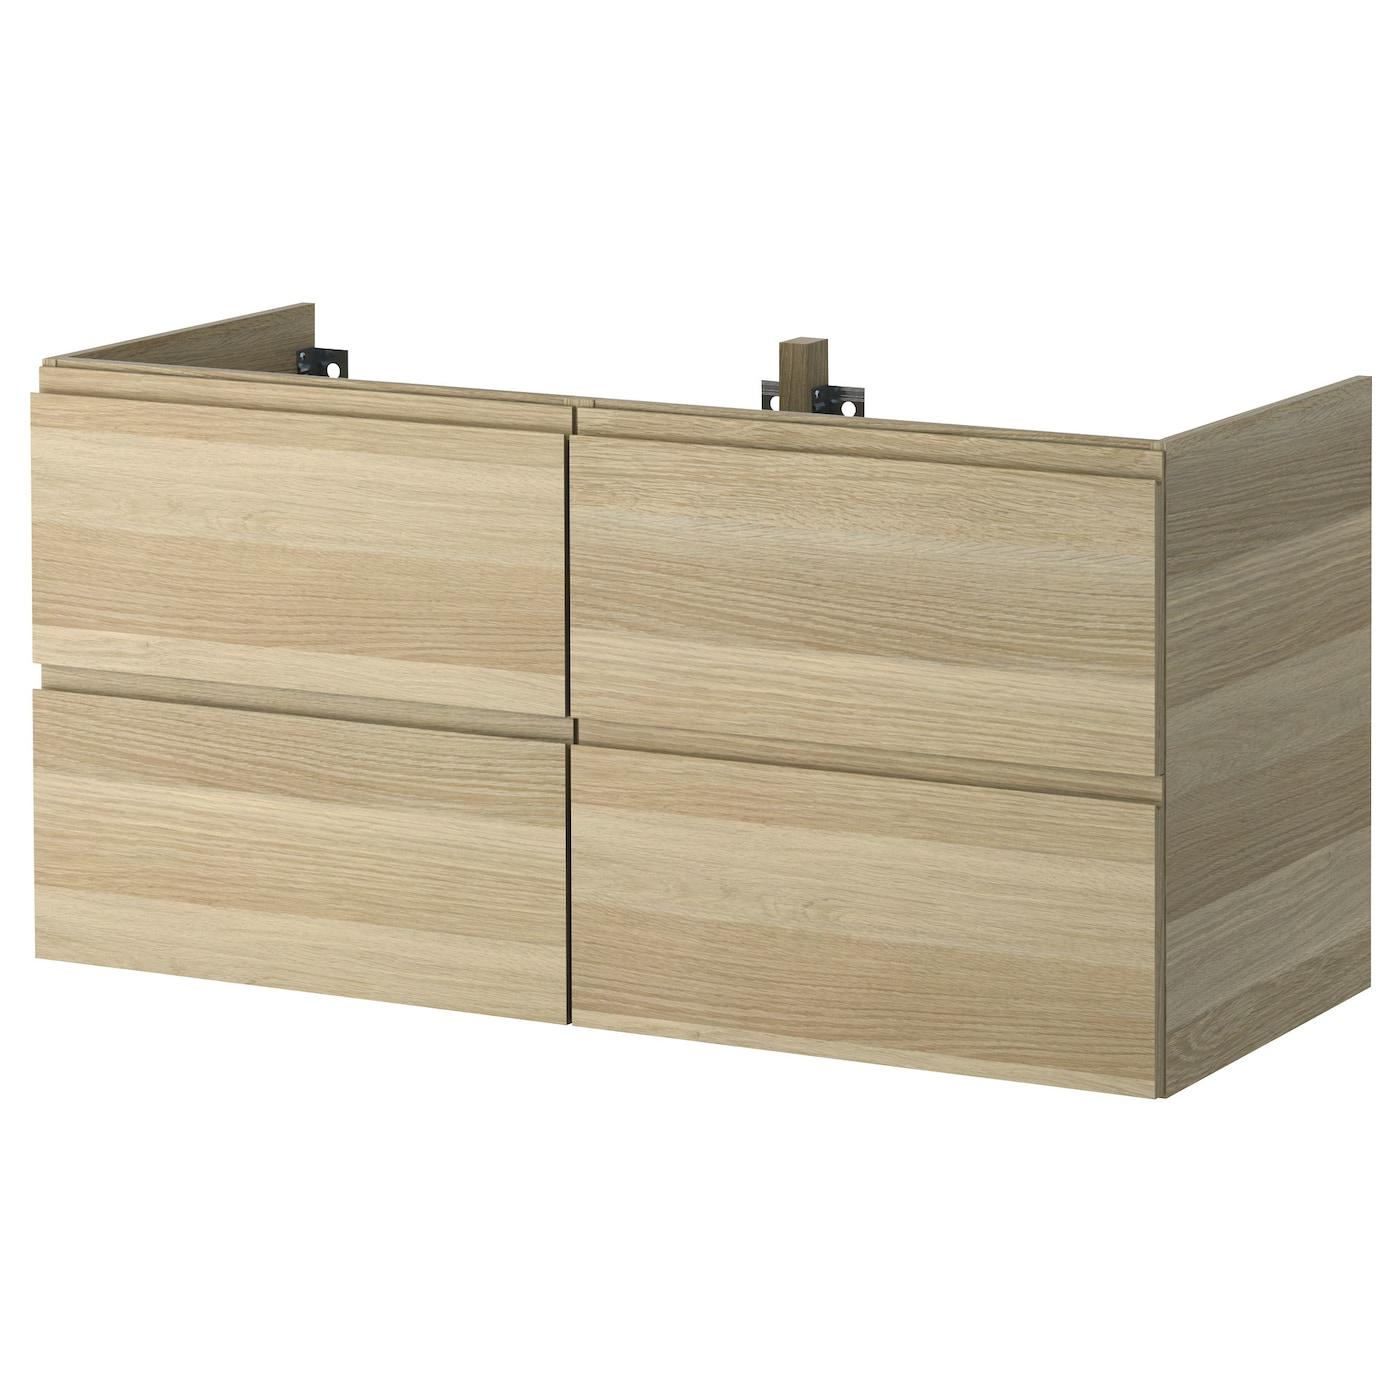 Malm Dressing Table Ikea Hack ~ Waschbeckenunterschränke online  Möbel Suchmaschine  moebelguru